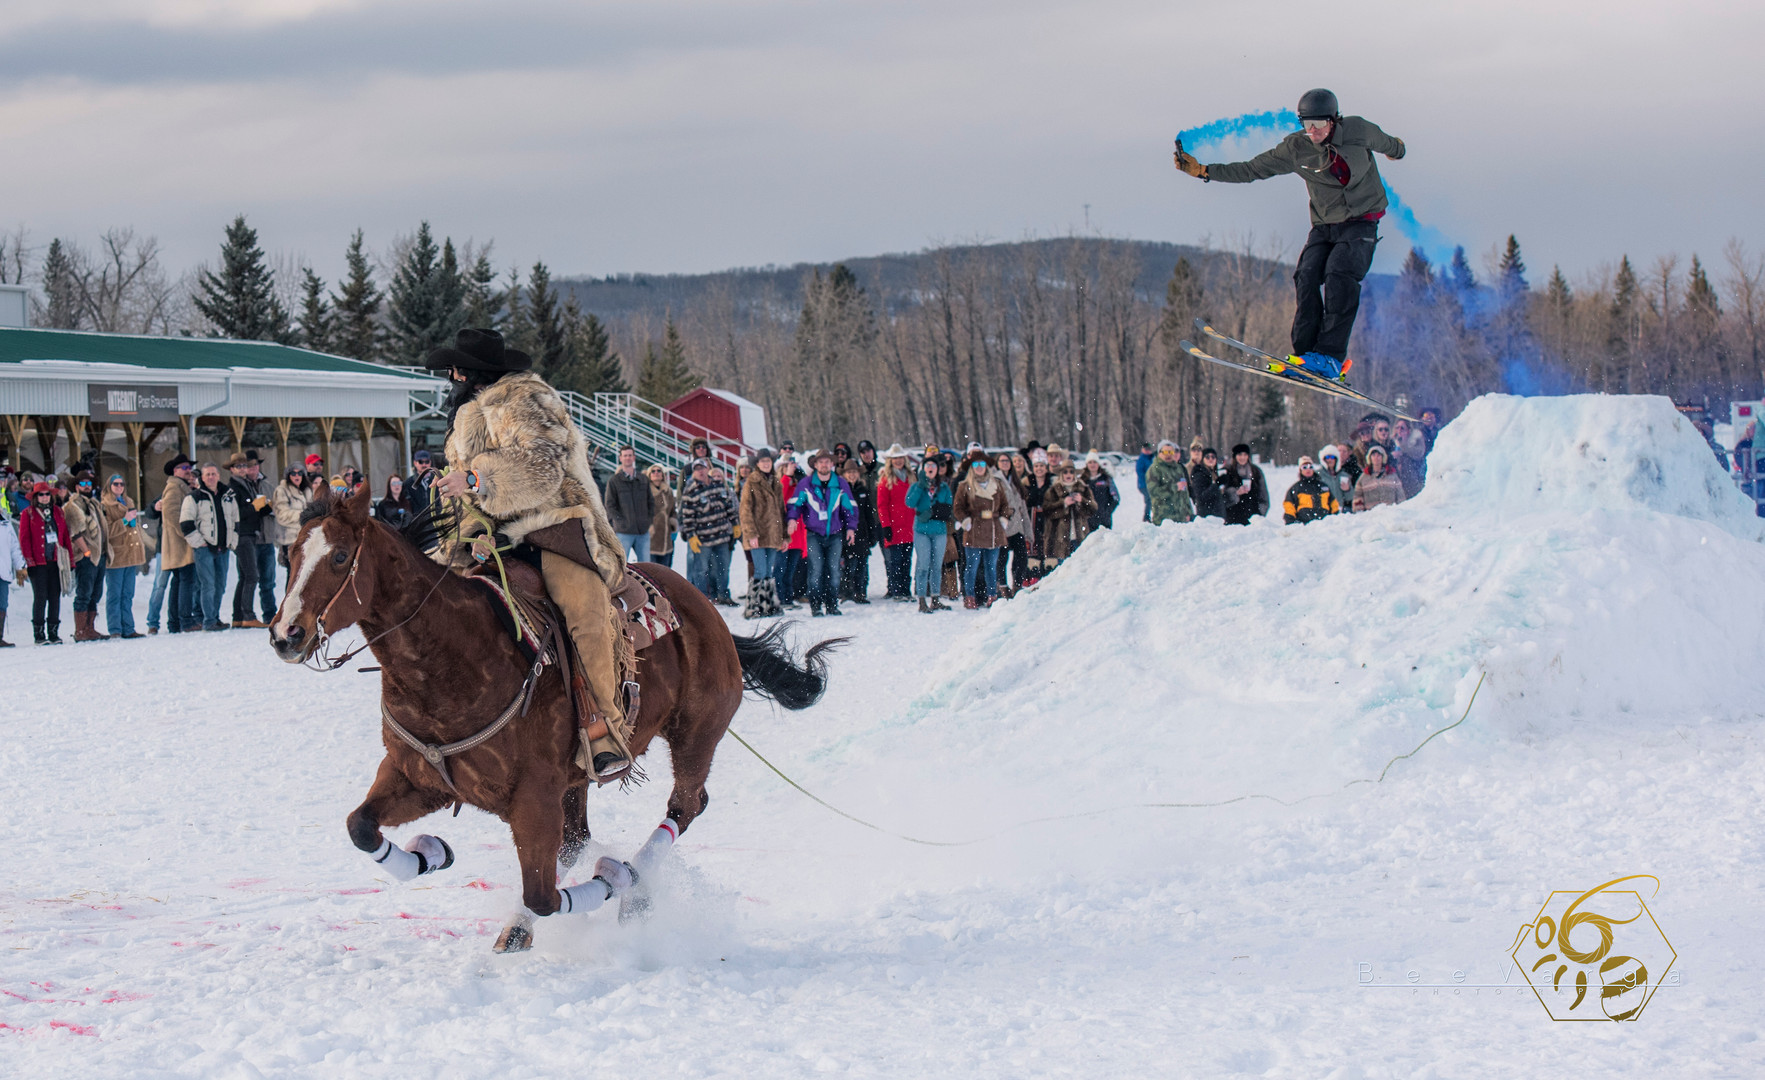 Jill Barron, Skijor in Millarvillage. January 2020.